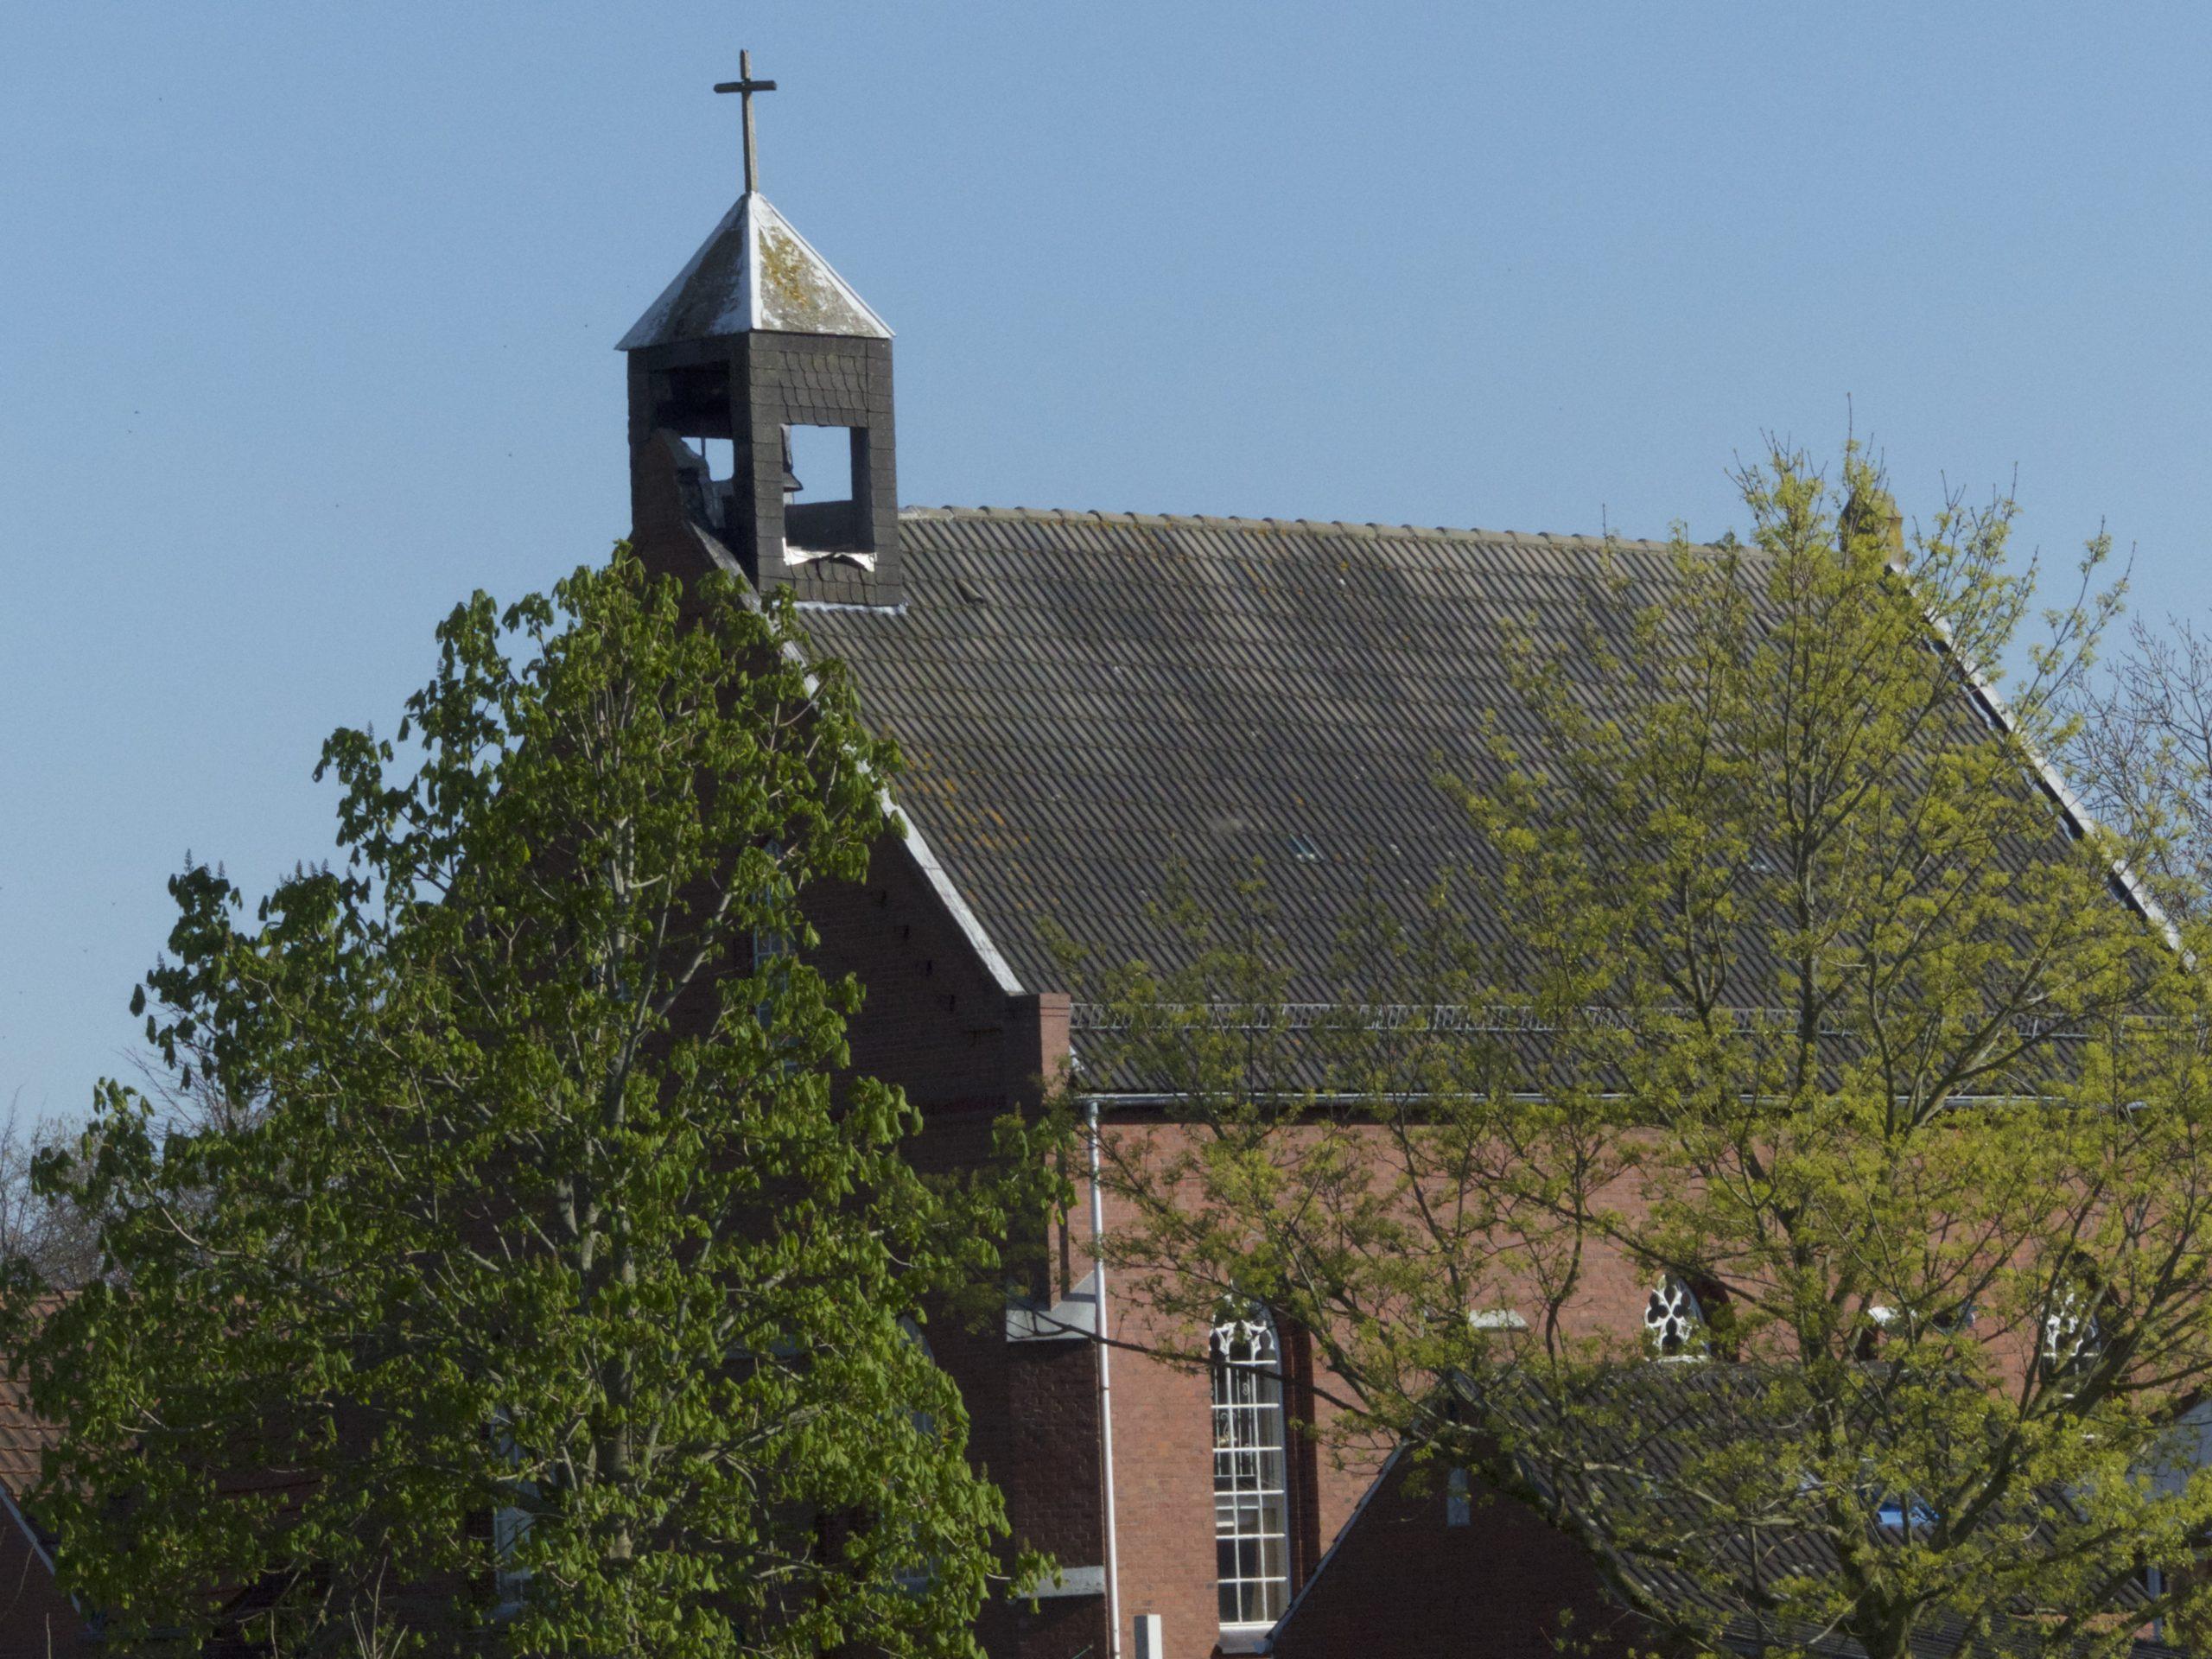 Altreformierte Kirche Campen